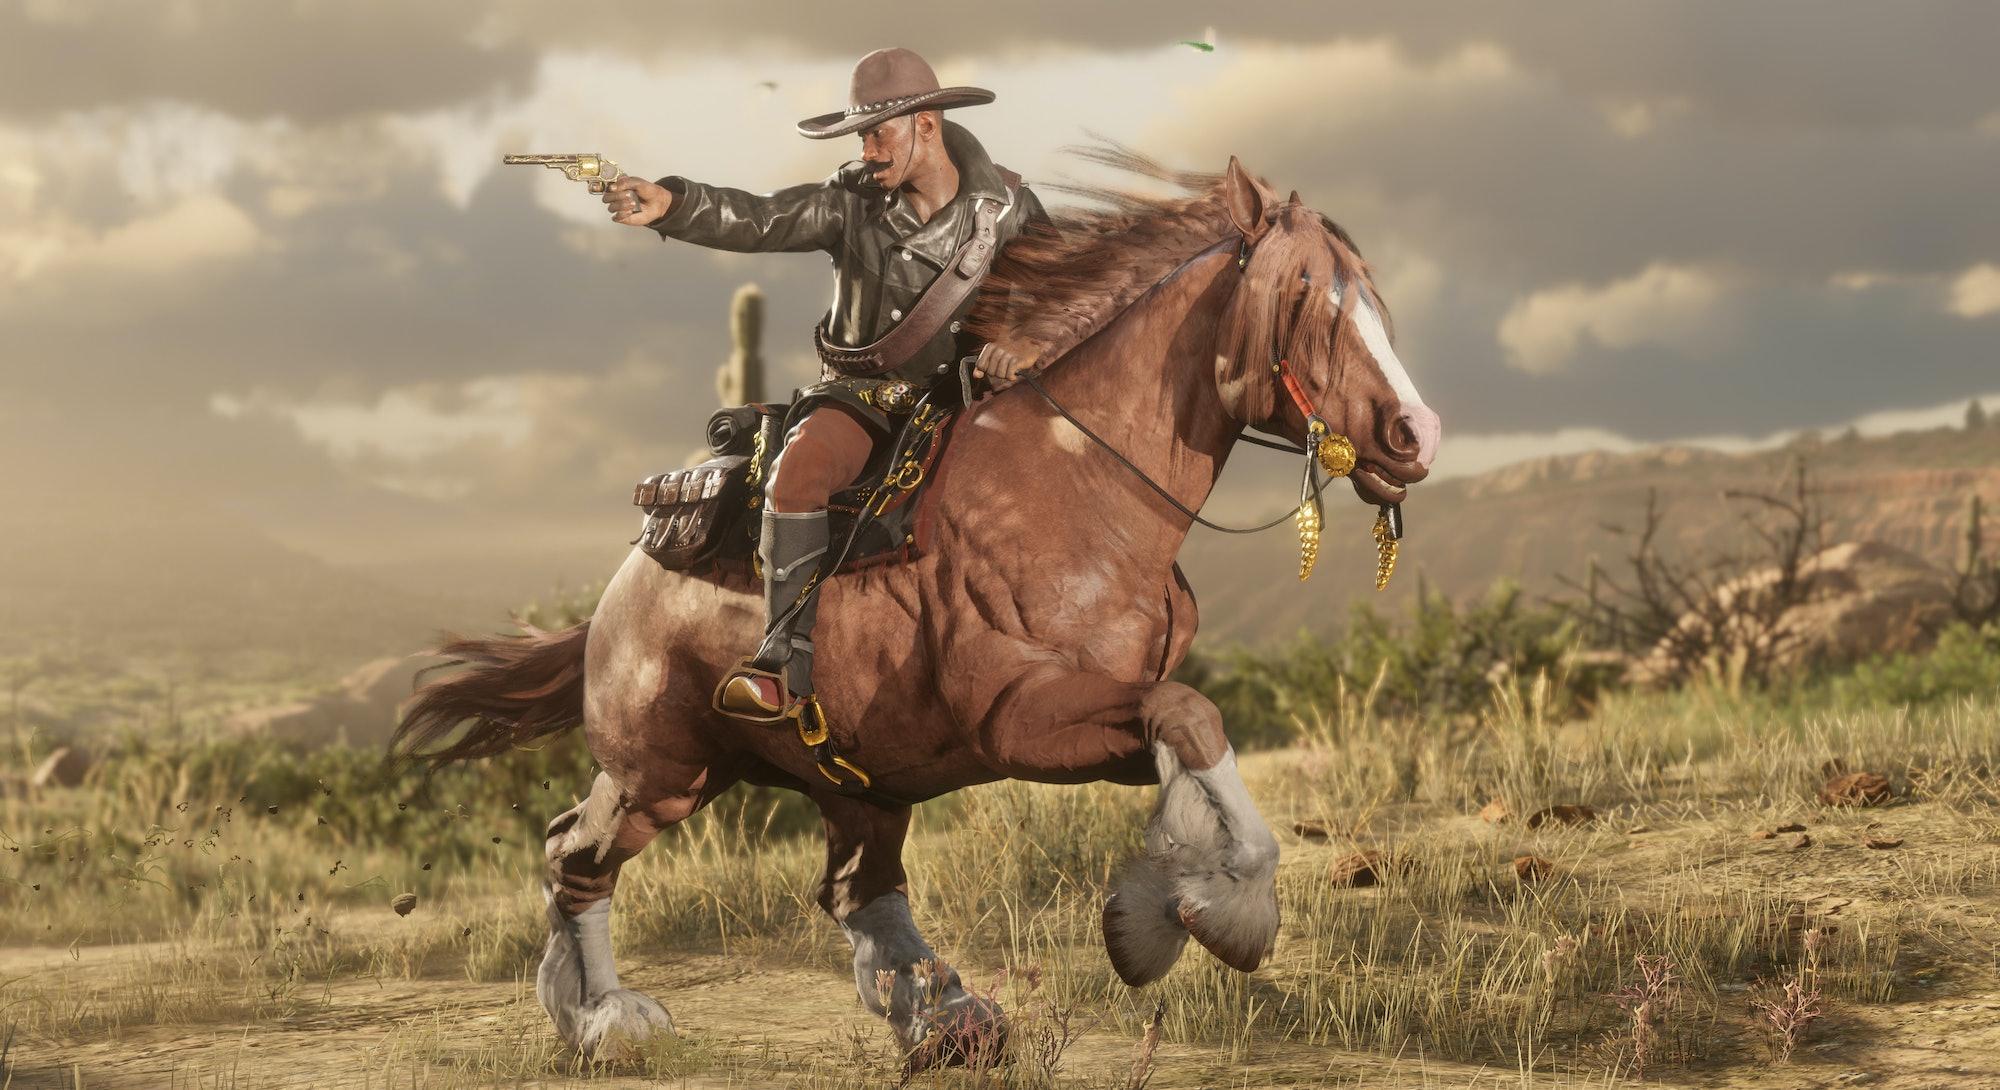 cowboy on horse firing gun in Red Dead Online promo art